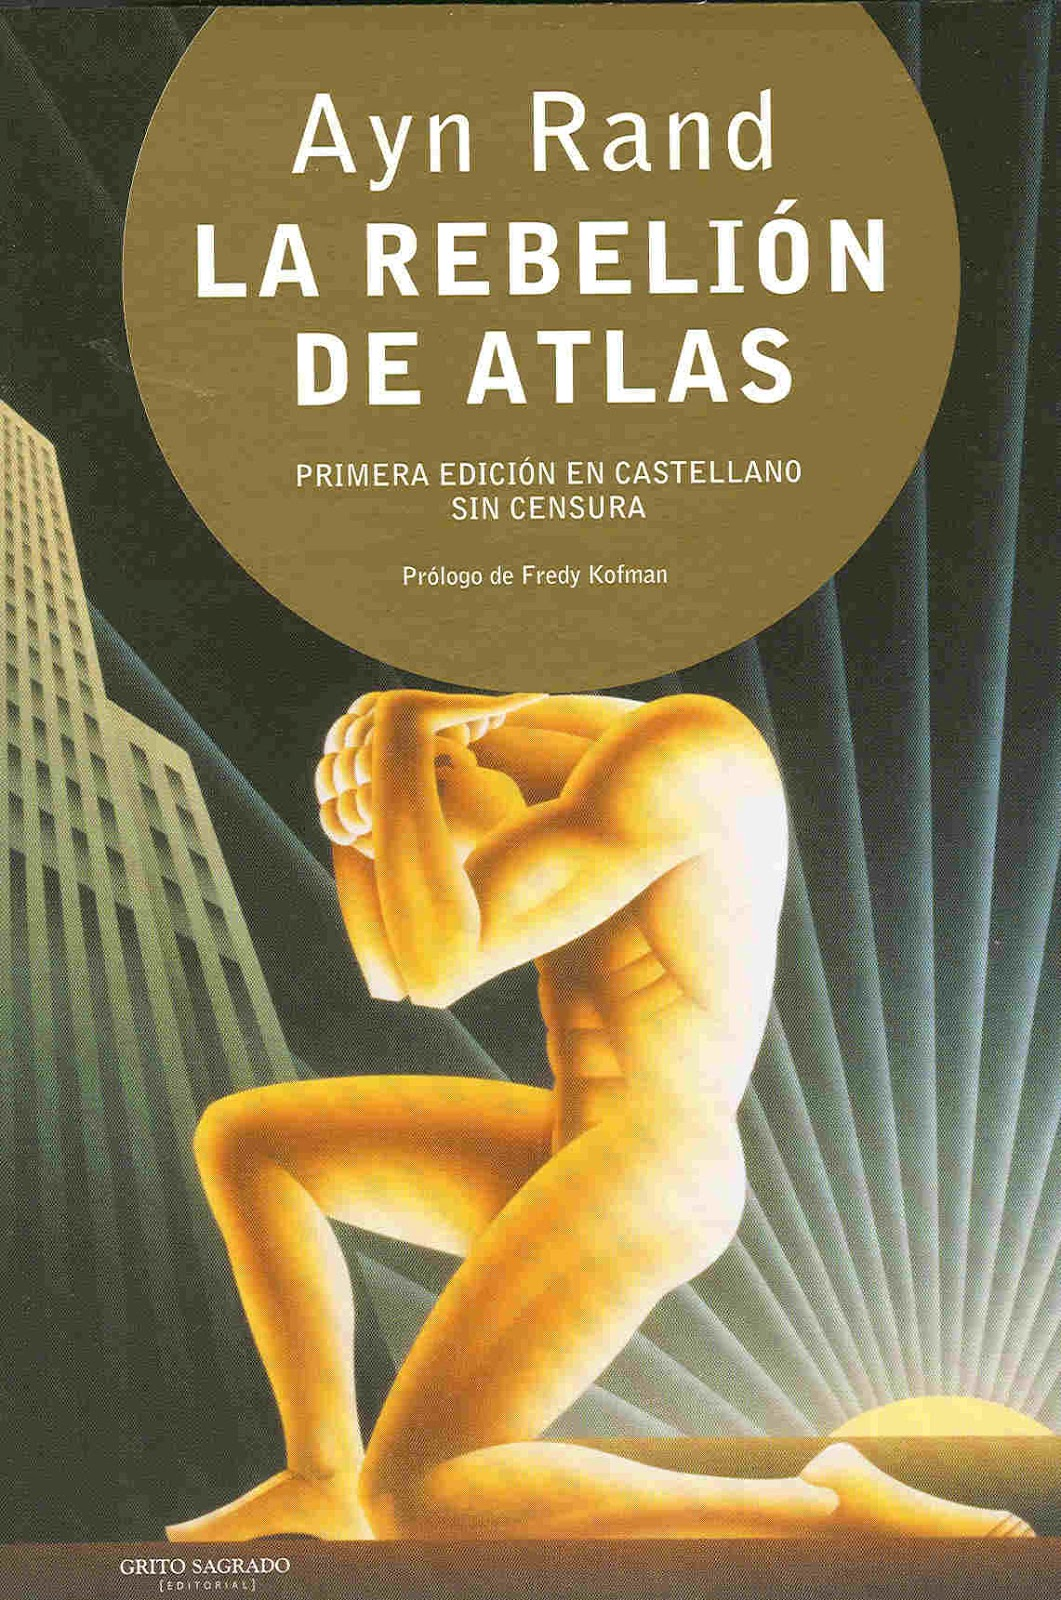 http://www.labibliotecadebella.blogspot.com.es/2013/05/ayn-rand-la-rebelion-del-atlas.html